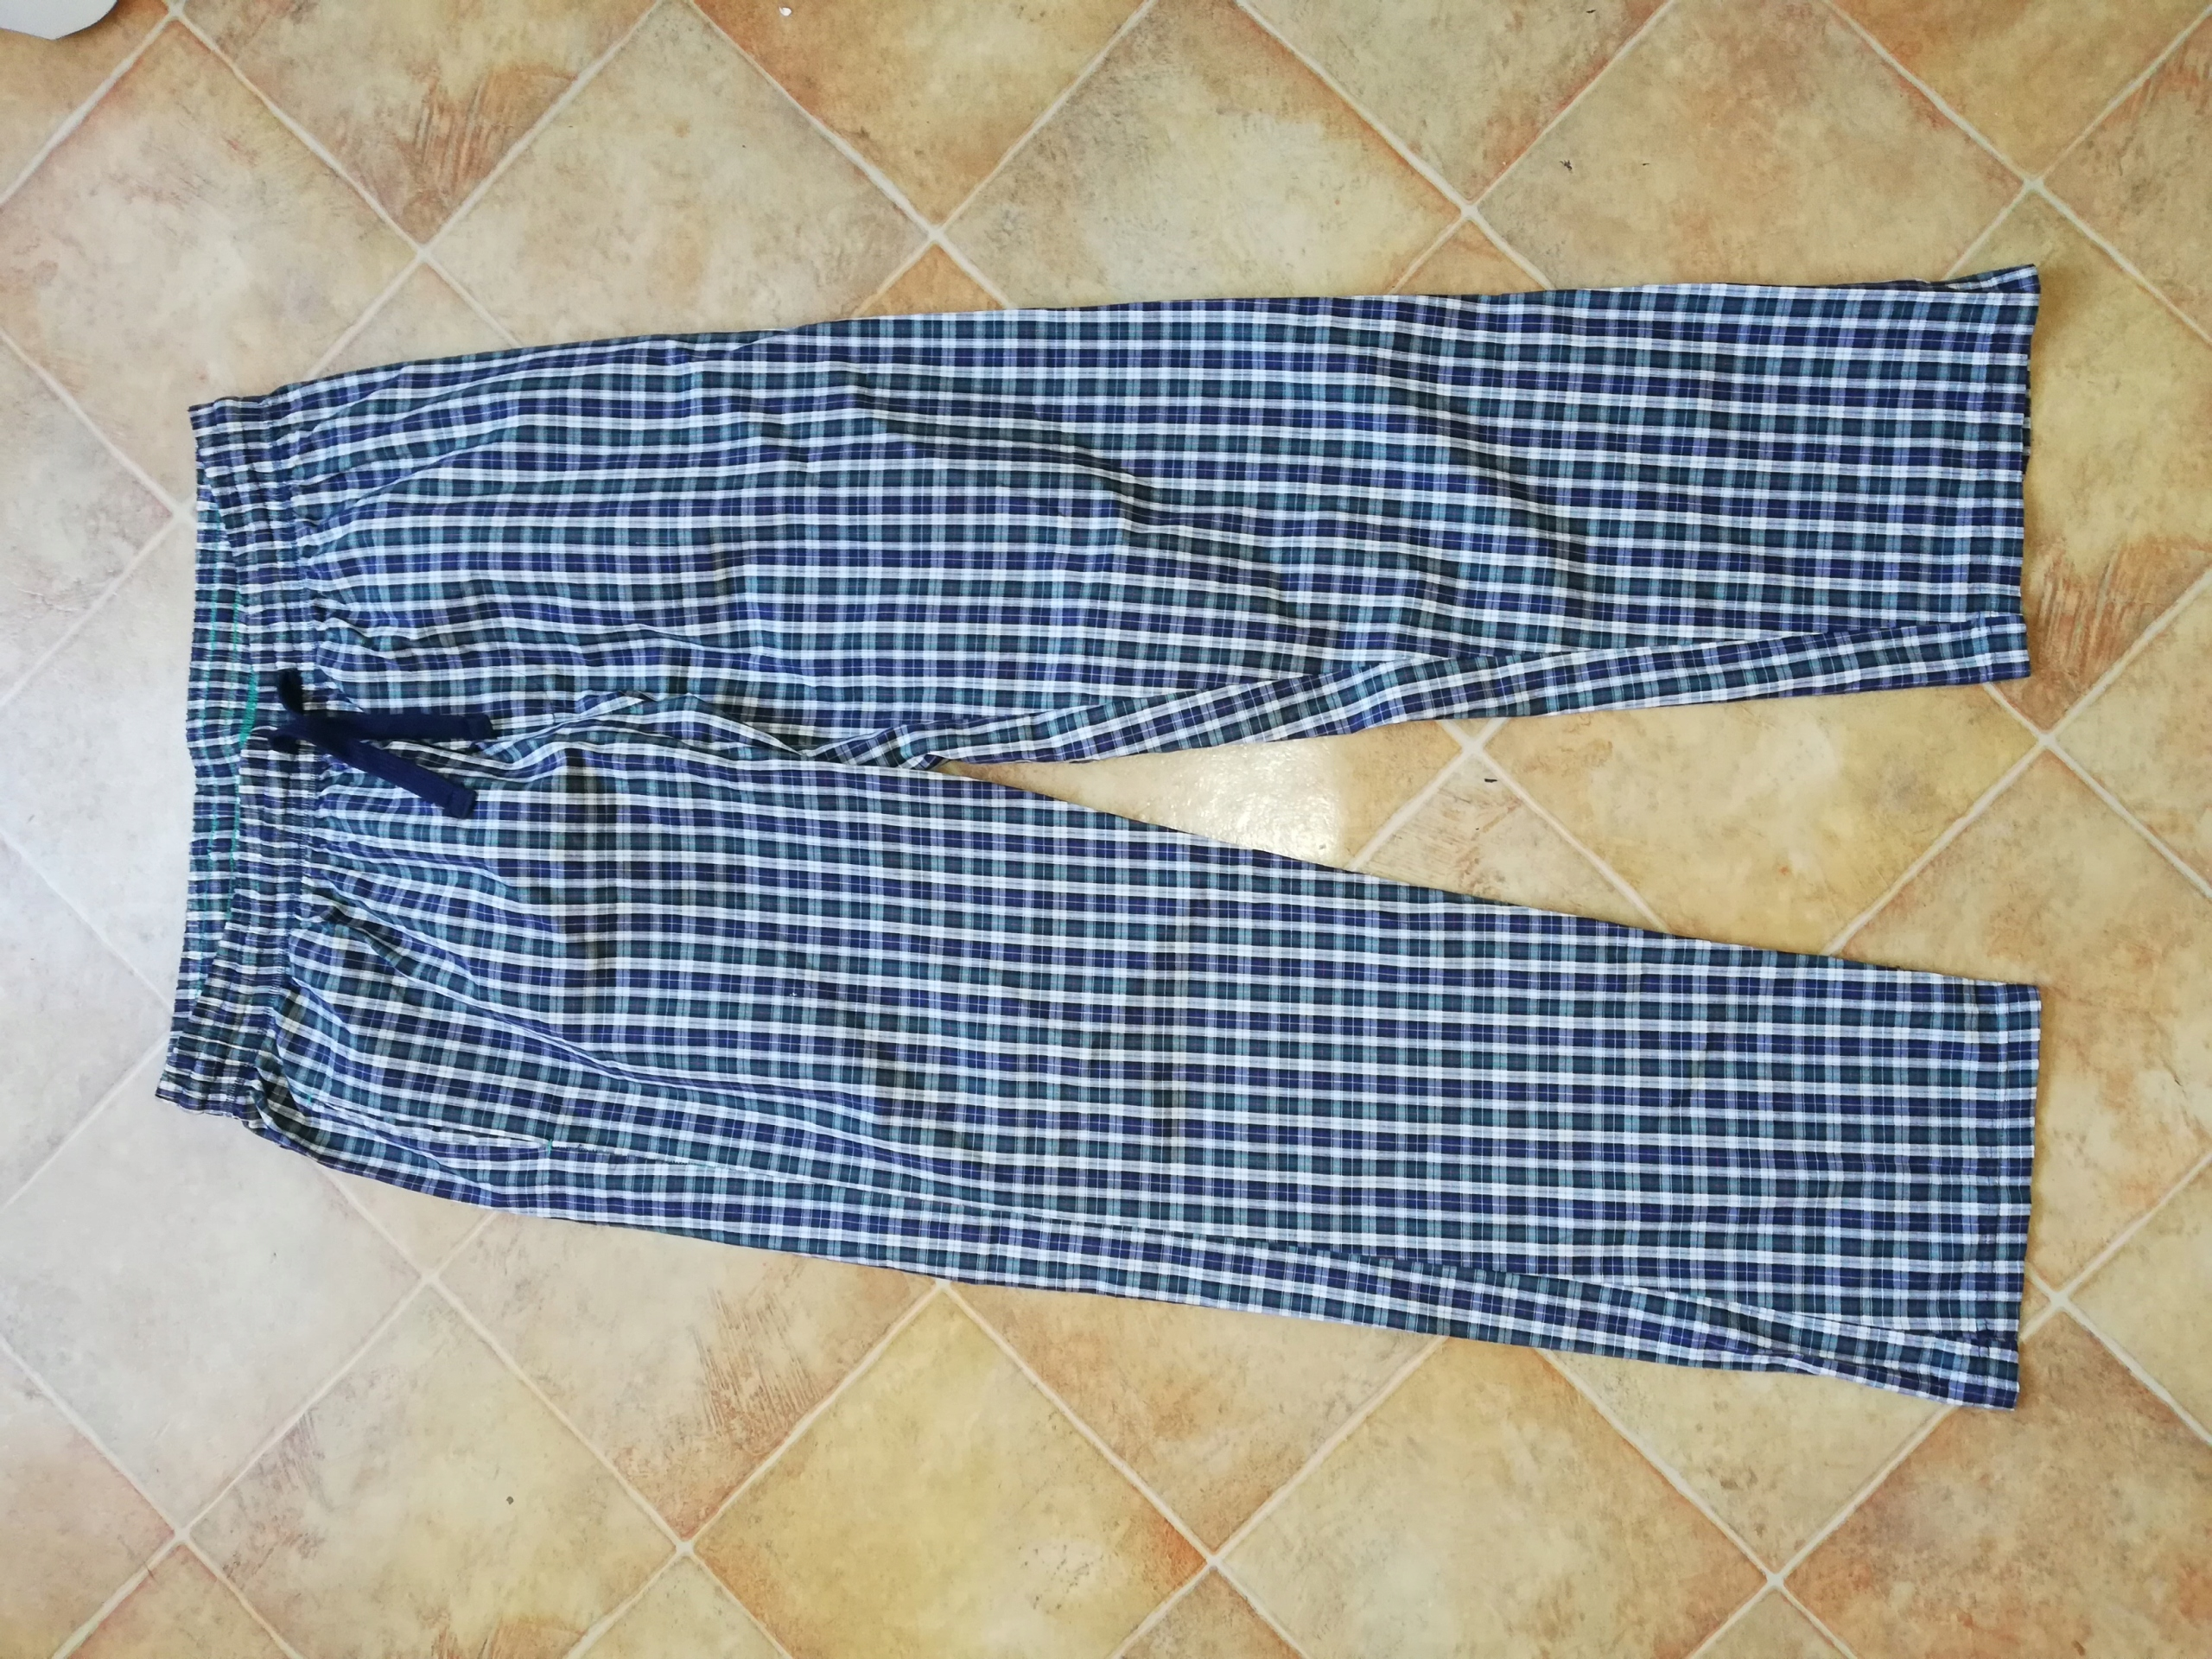 spodnie męskie do spania NEXT r.XL/XXL